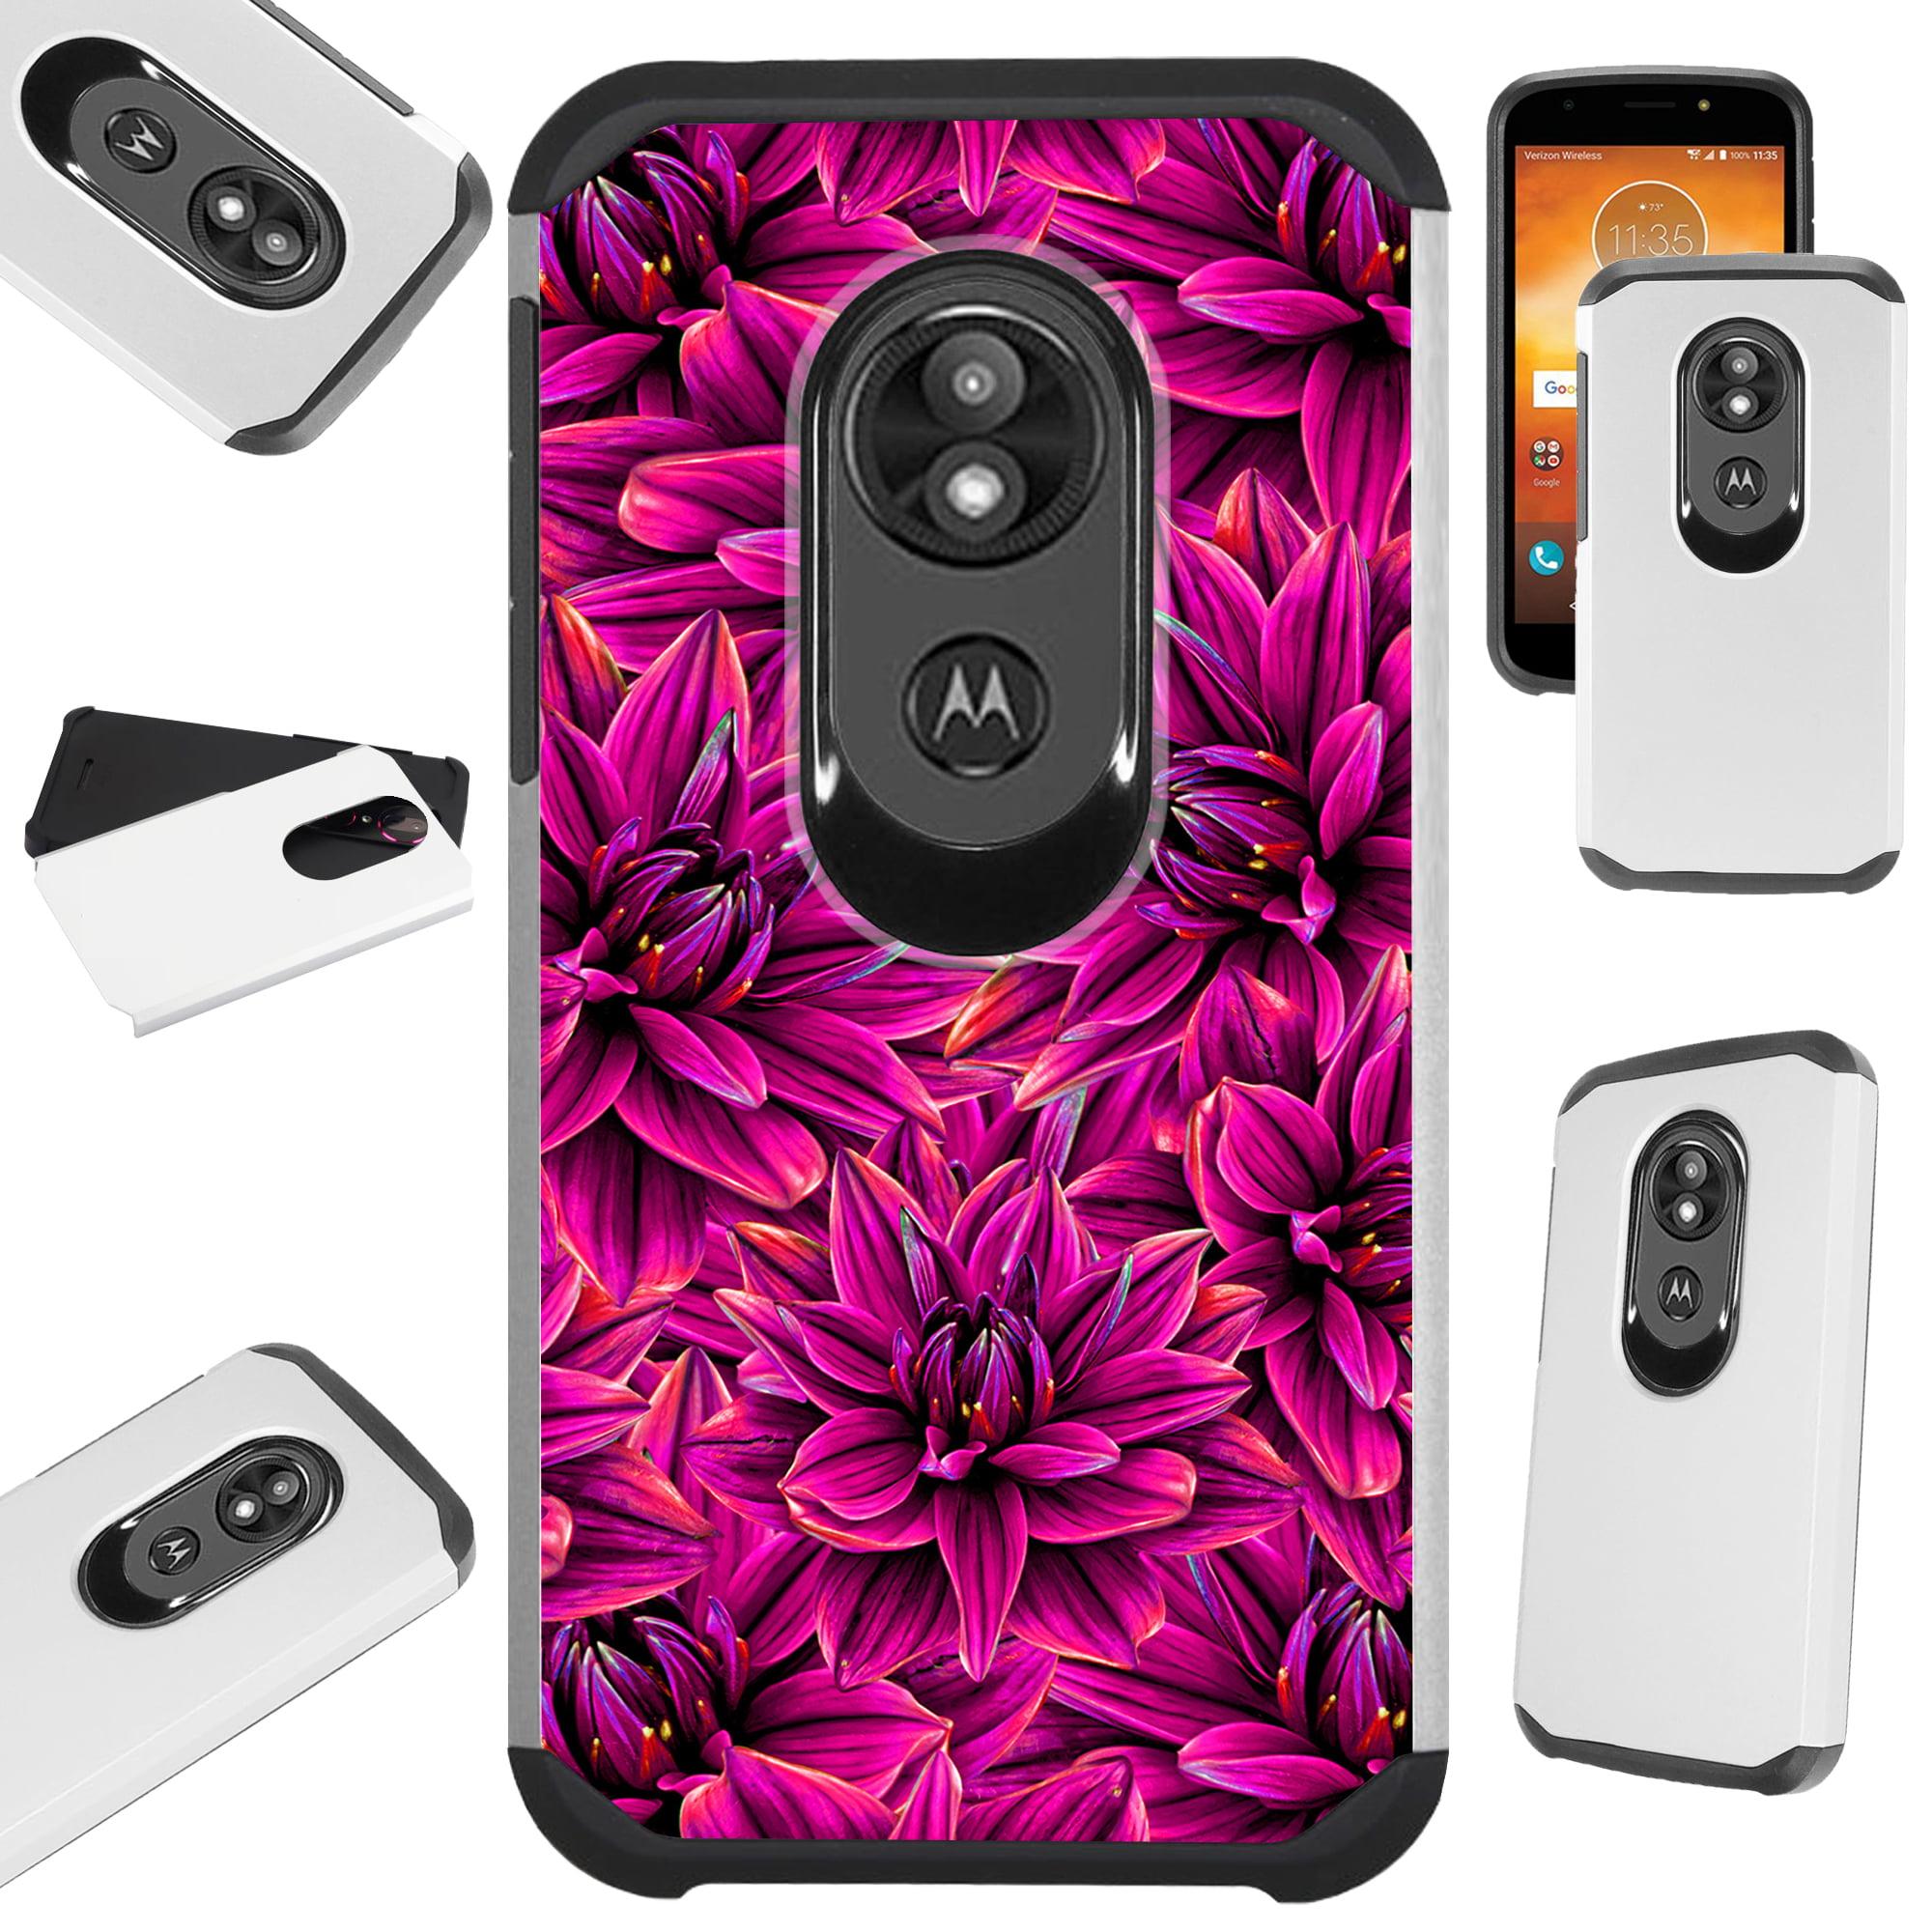 For Motorola Moto E5 Play | Moto E5 Cruise Case Hybrid TPU Fusion Phone Cover (Purple Blossom Flower)